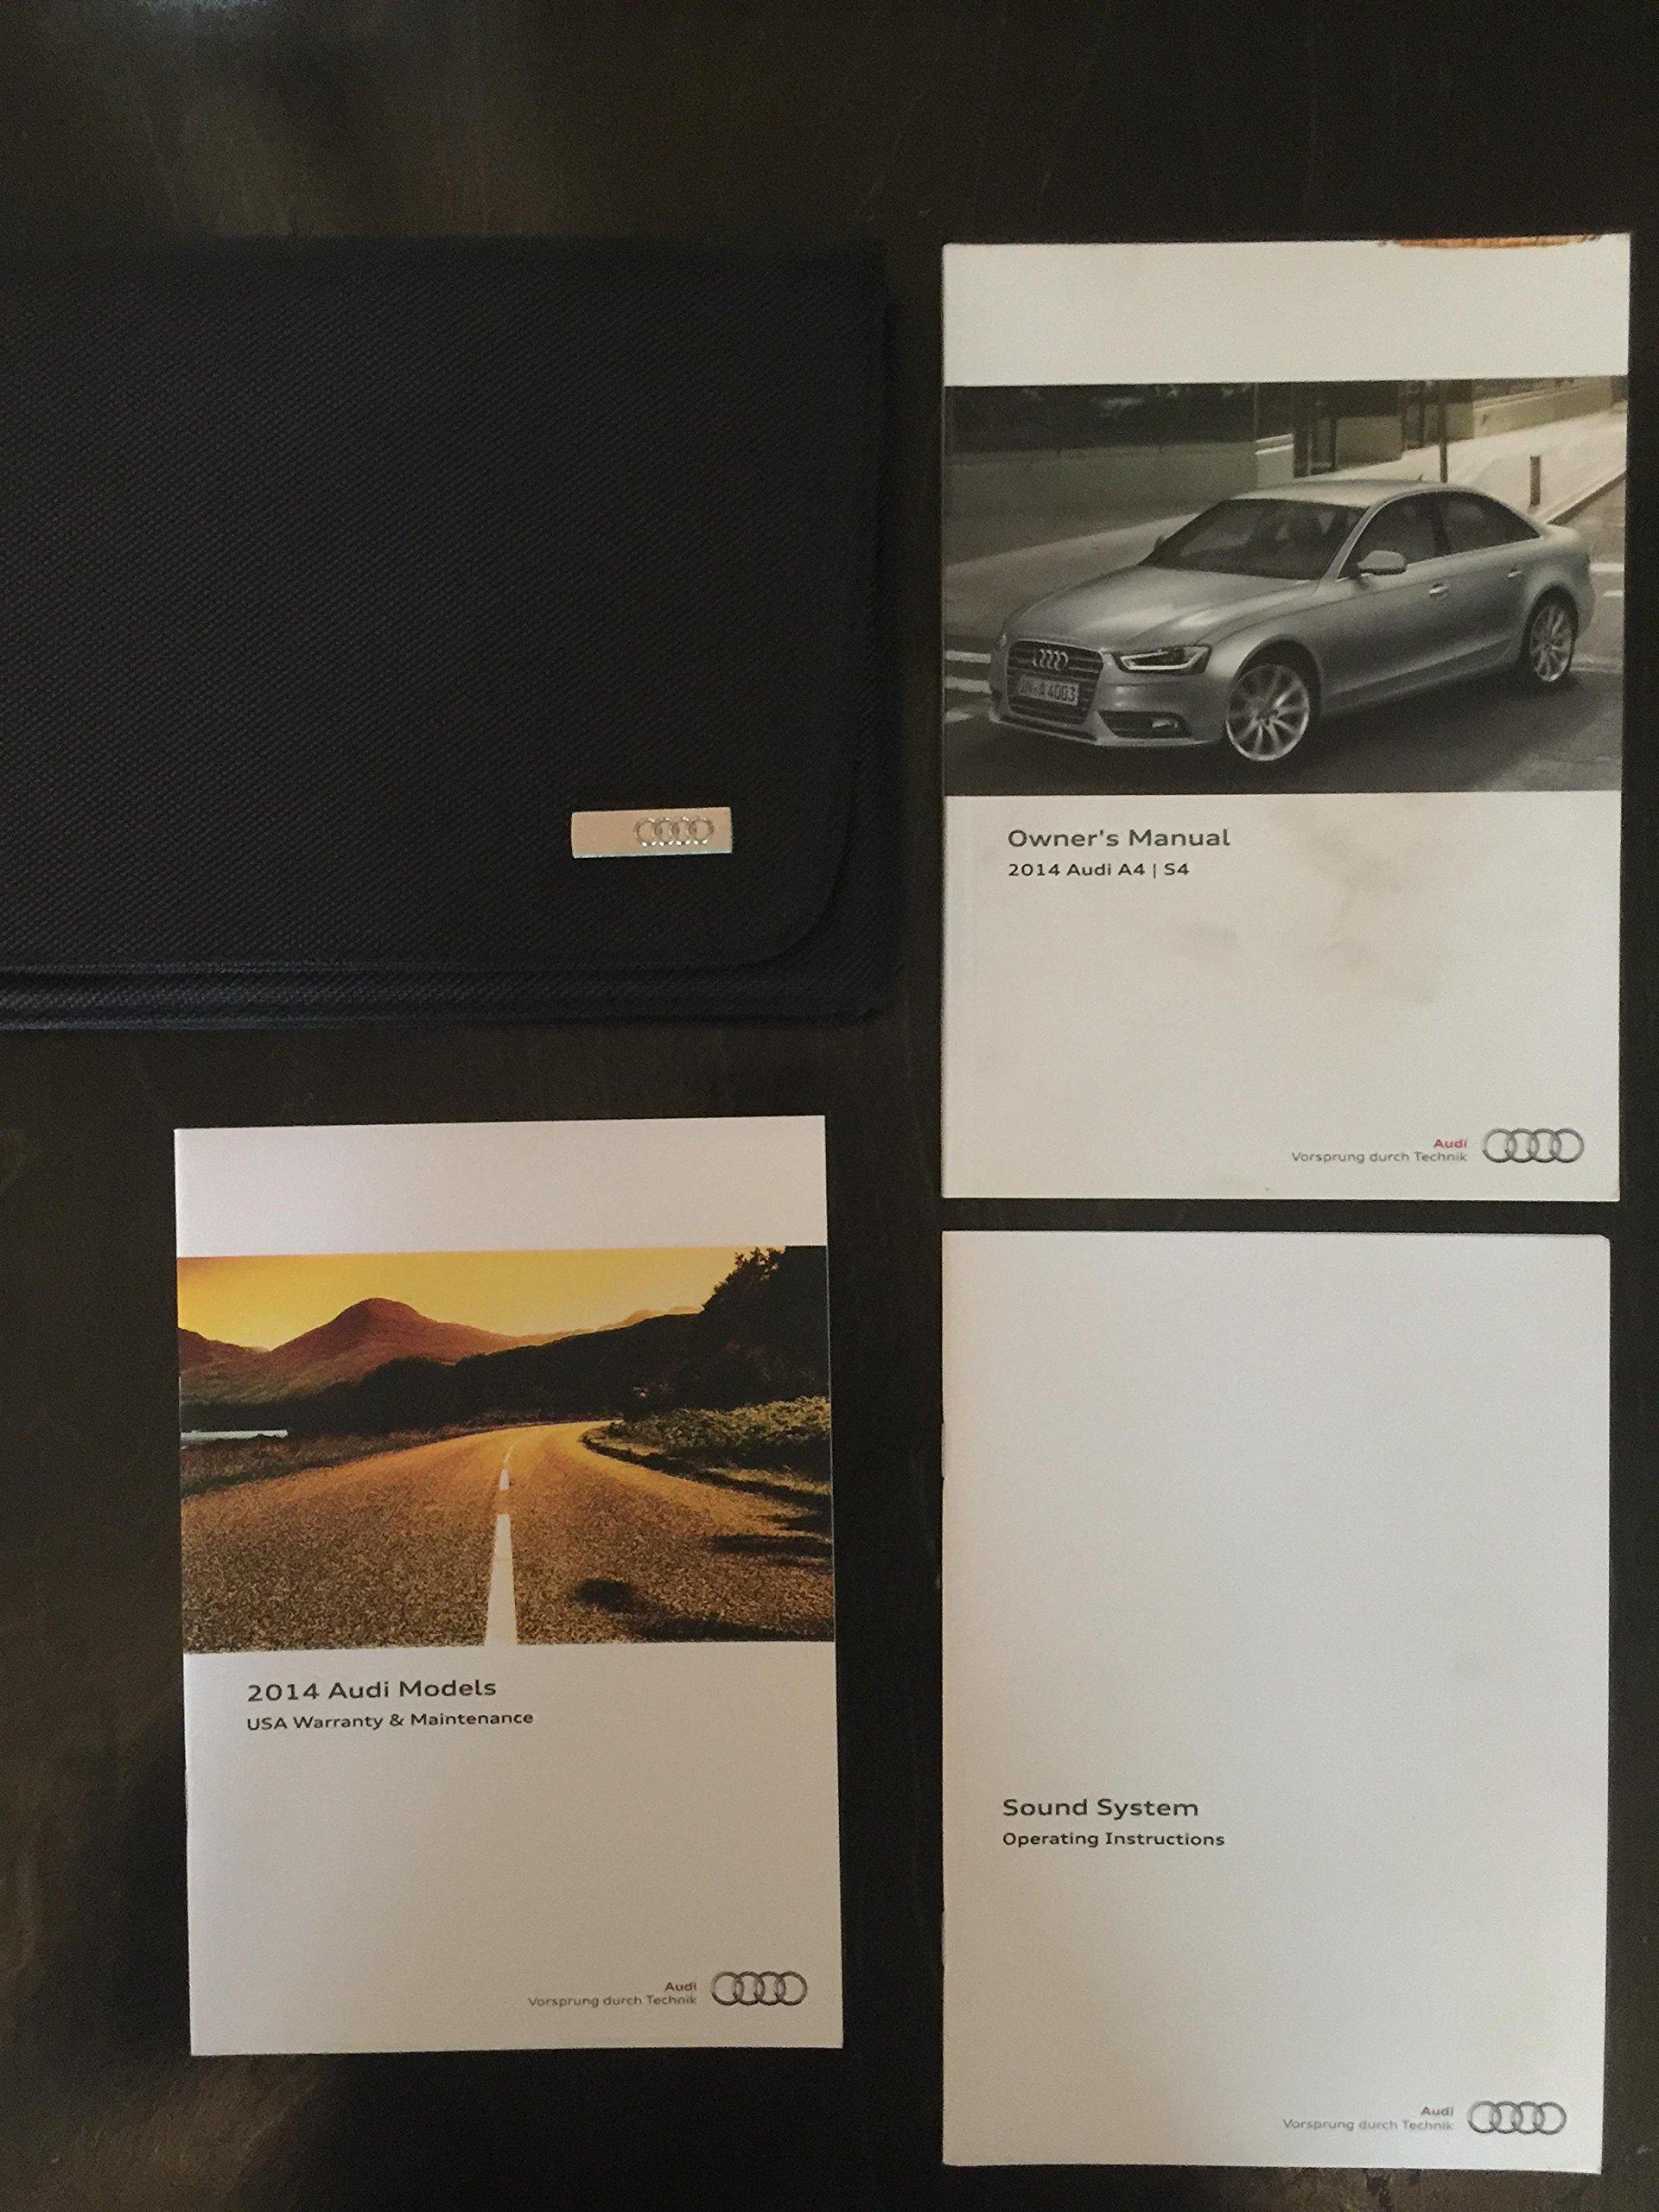 2014 audi a4 s4 owners manual audi amazon com books rh amazon com 2014 audi s4 service manual 2011 Audi S4 Manual